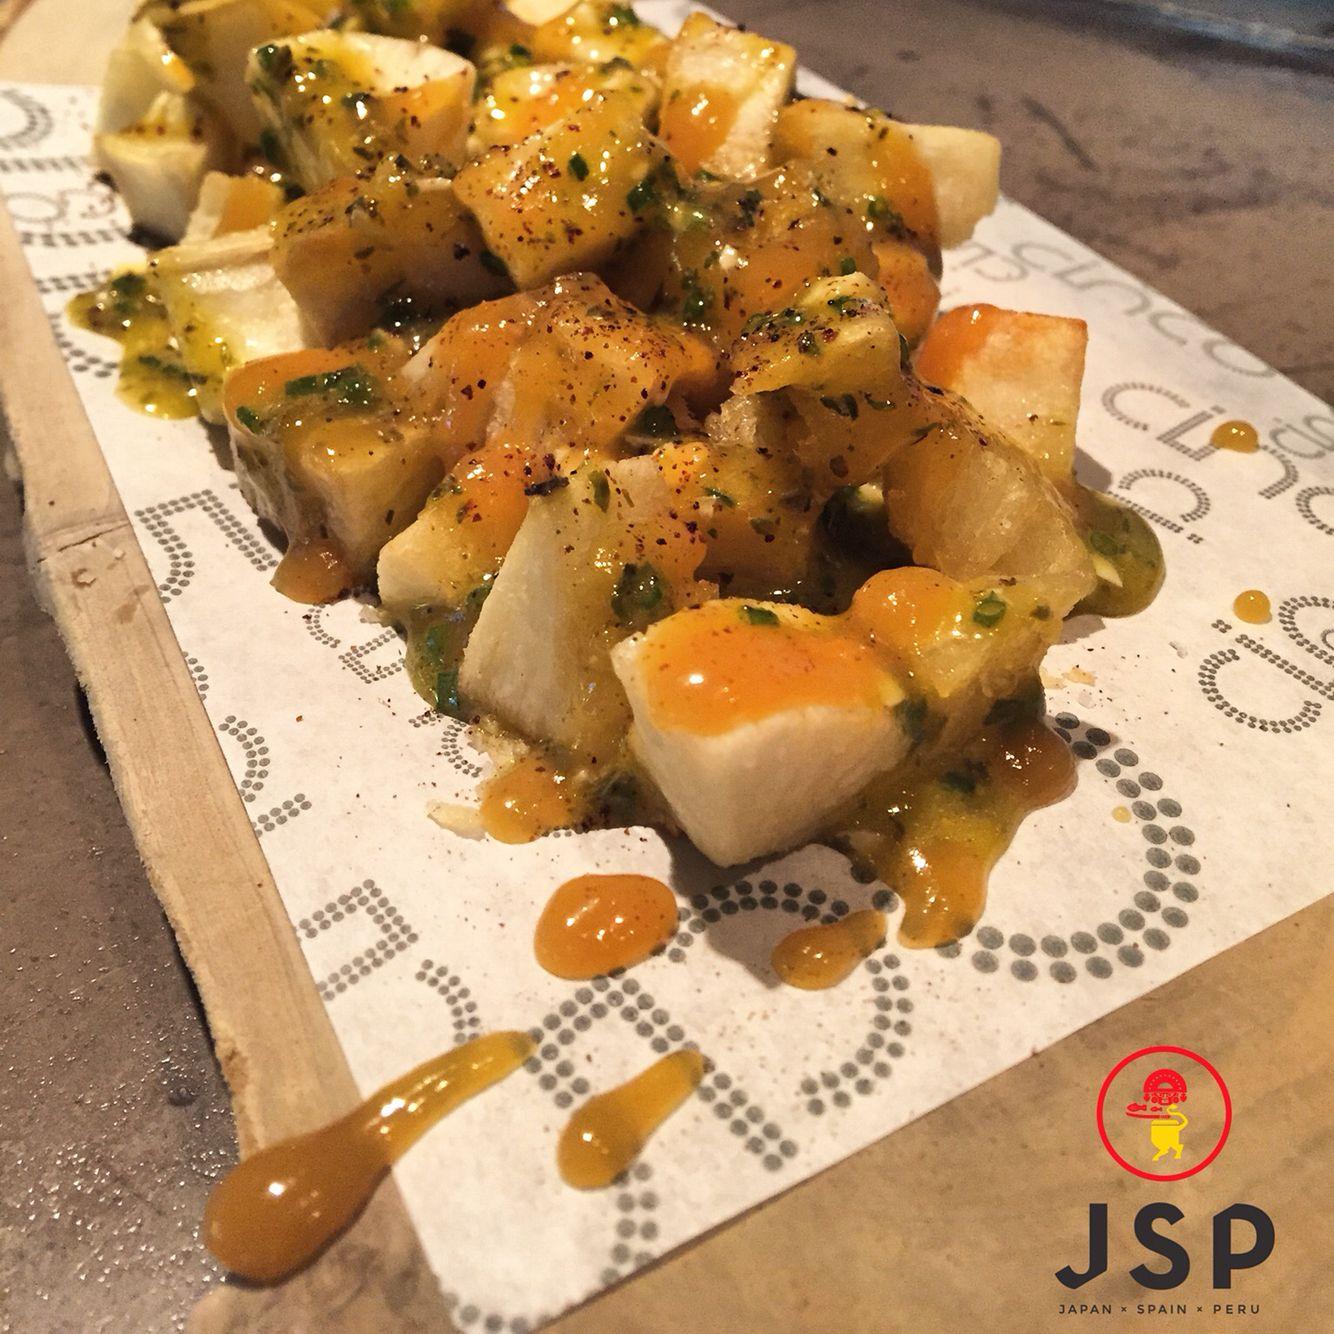 Yuca Brava Style***** Yuca patatas Bravas style,Egg Vinaigrette,Fresh Cress Cinco JSP Let's rock \m/